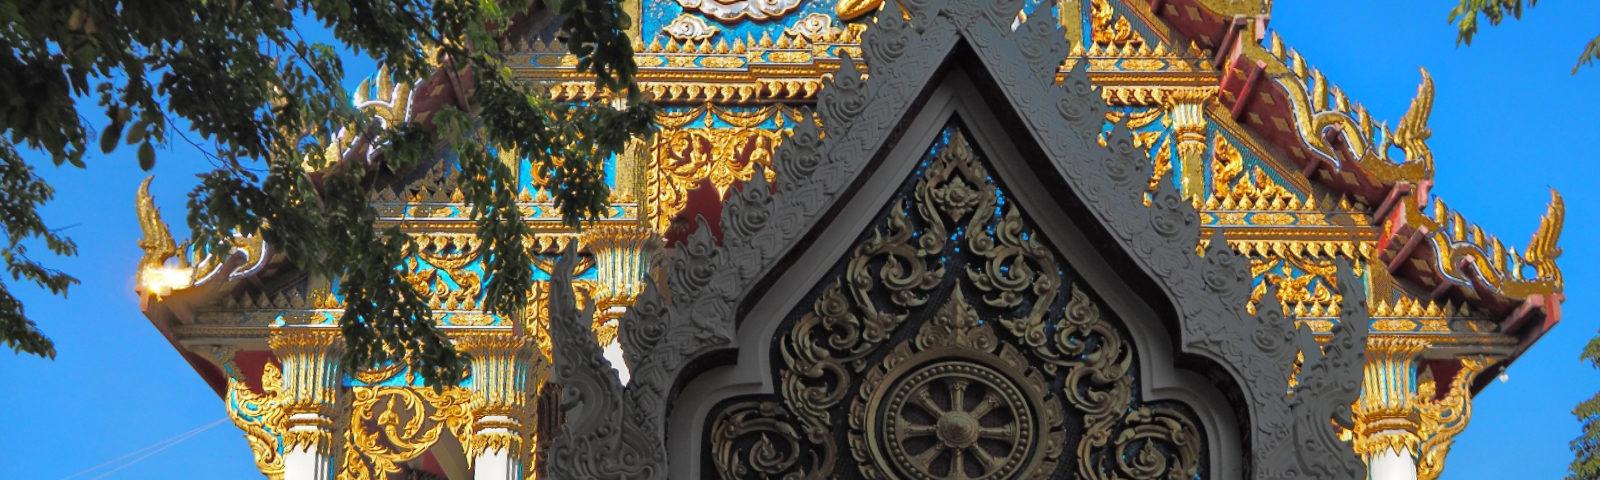 Thailand Bangkok Wat Phra Kraisi Tempel